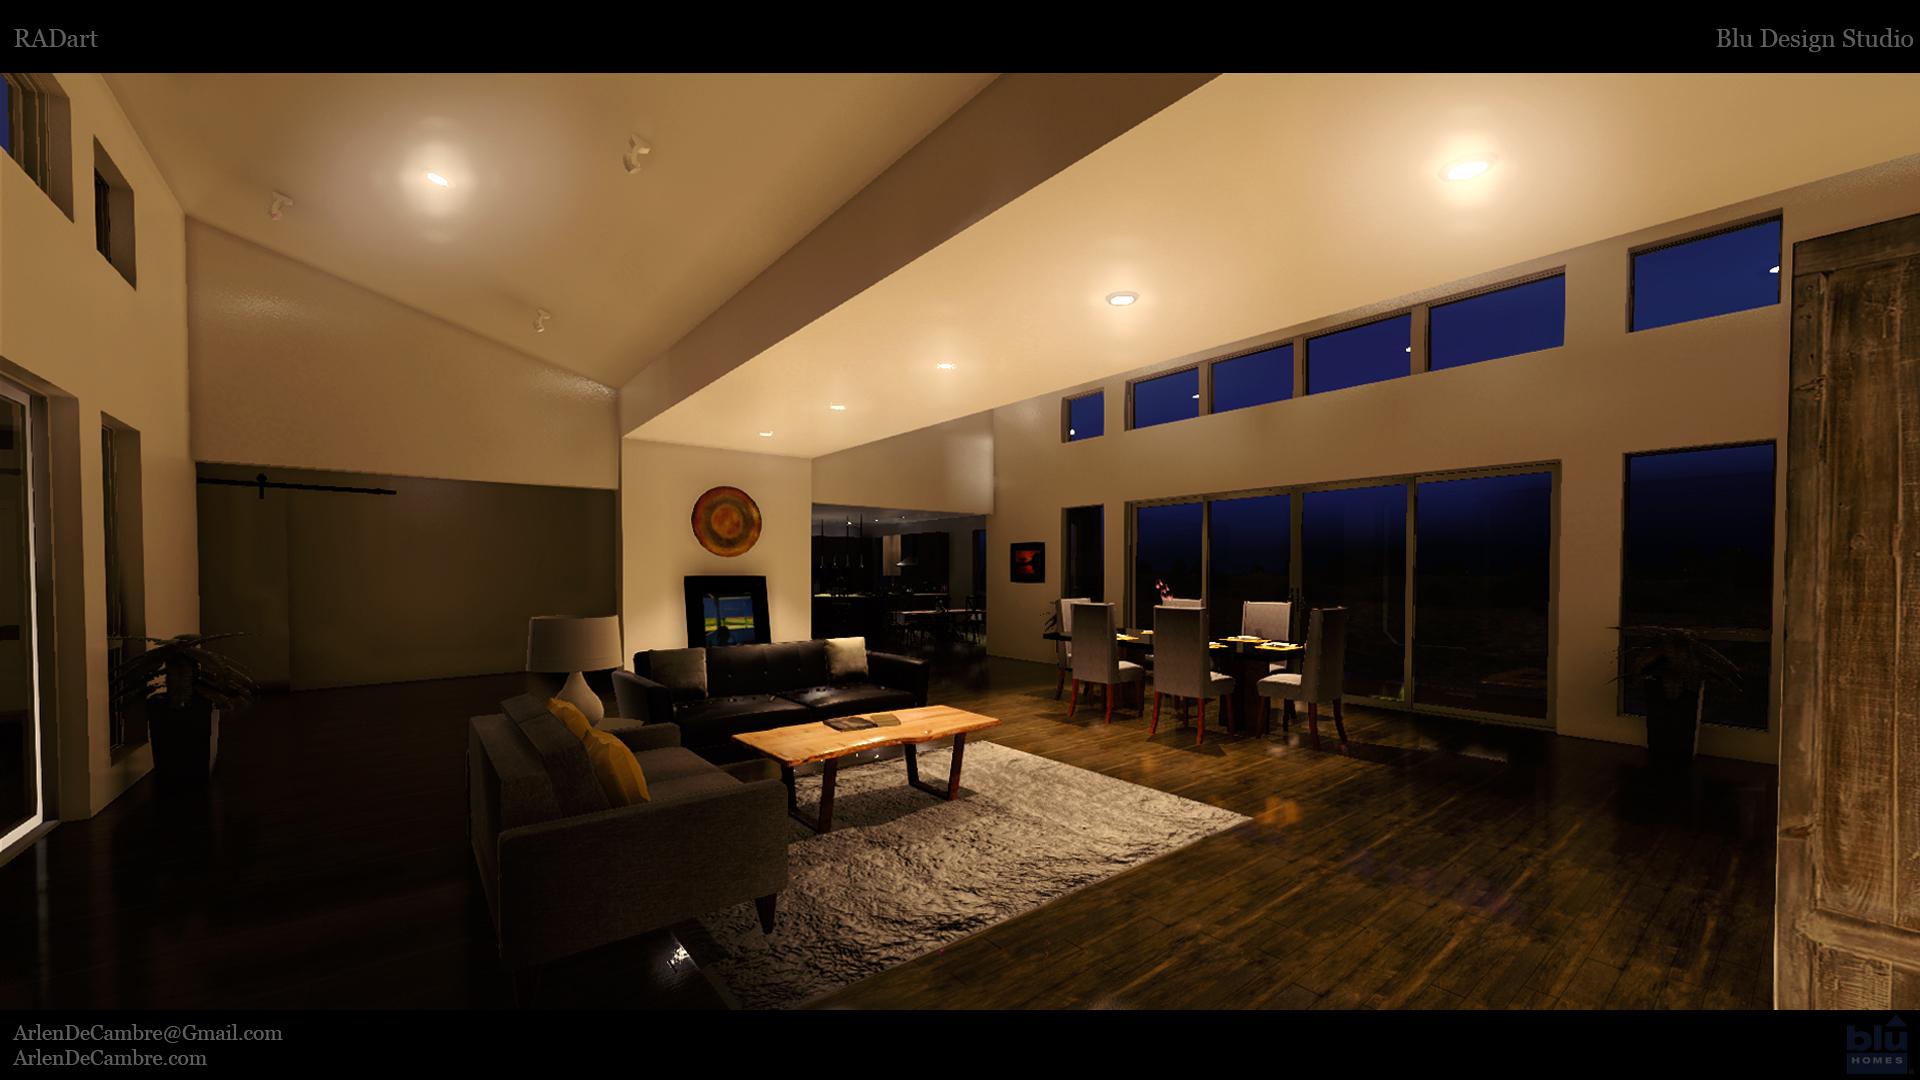 Interior Design With Unity